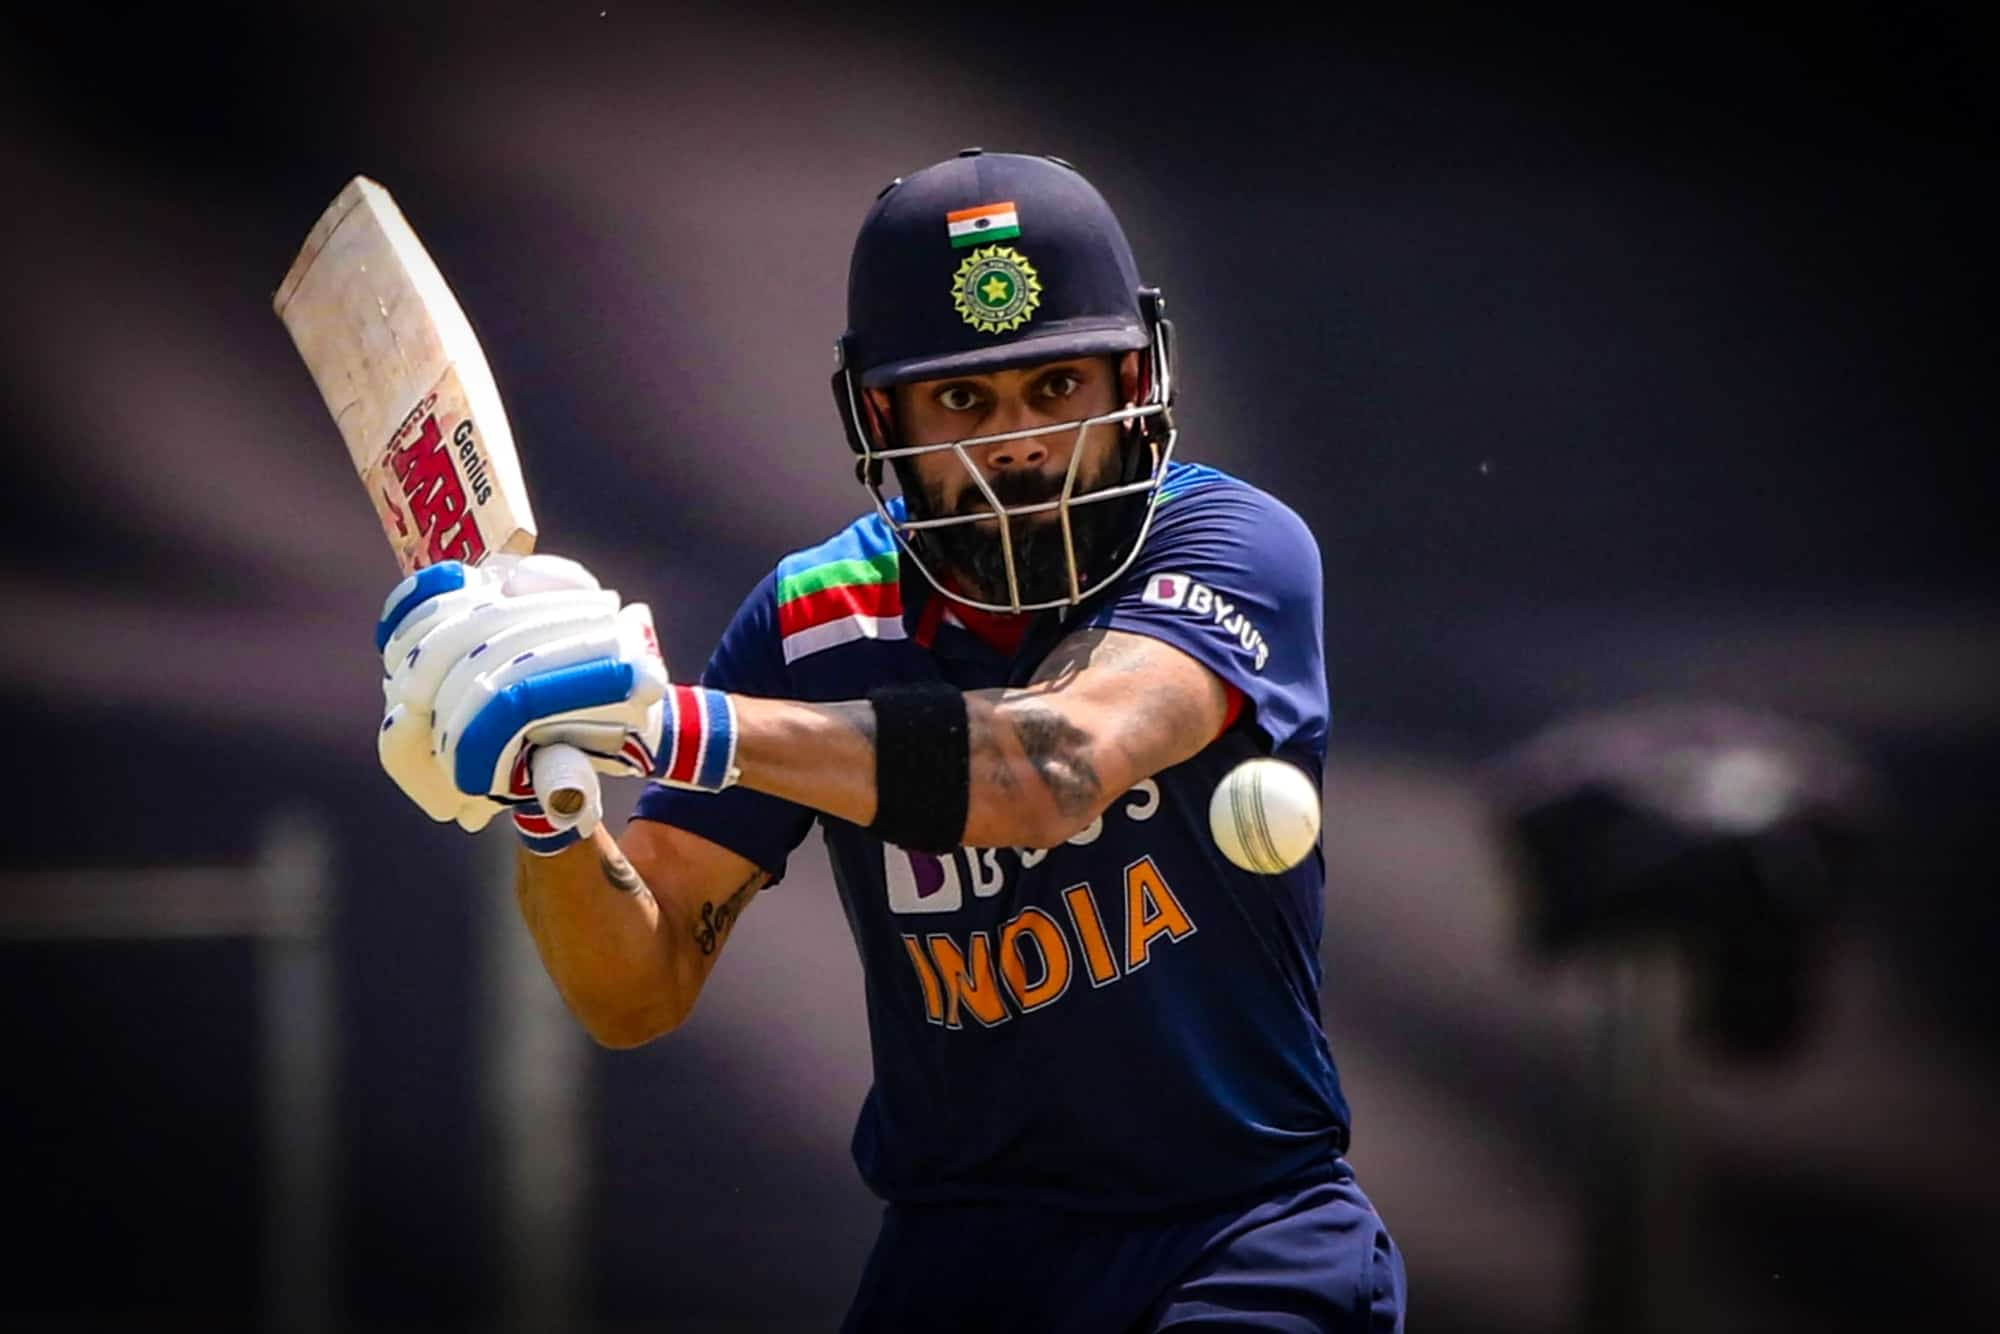 Virat Kohli goes past Graeme Smith's Tally